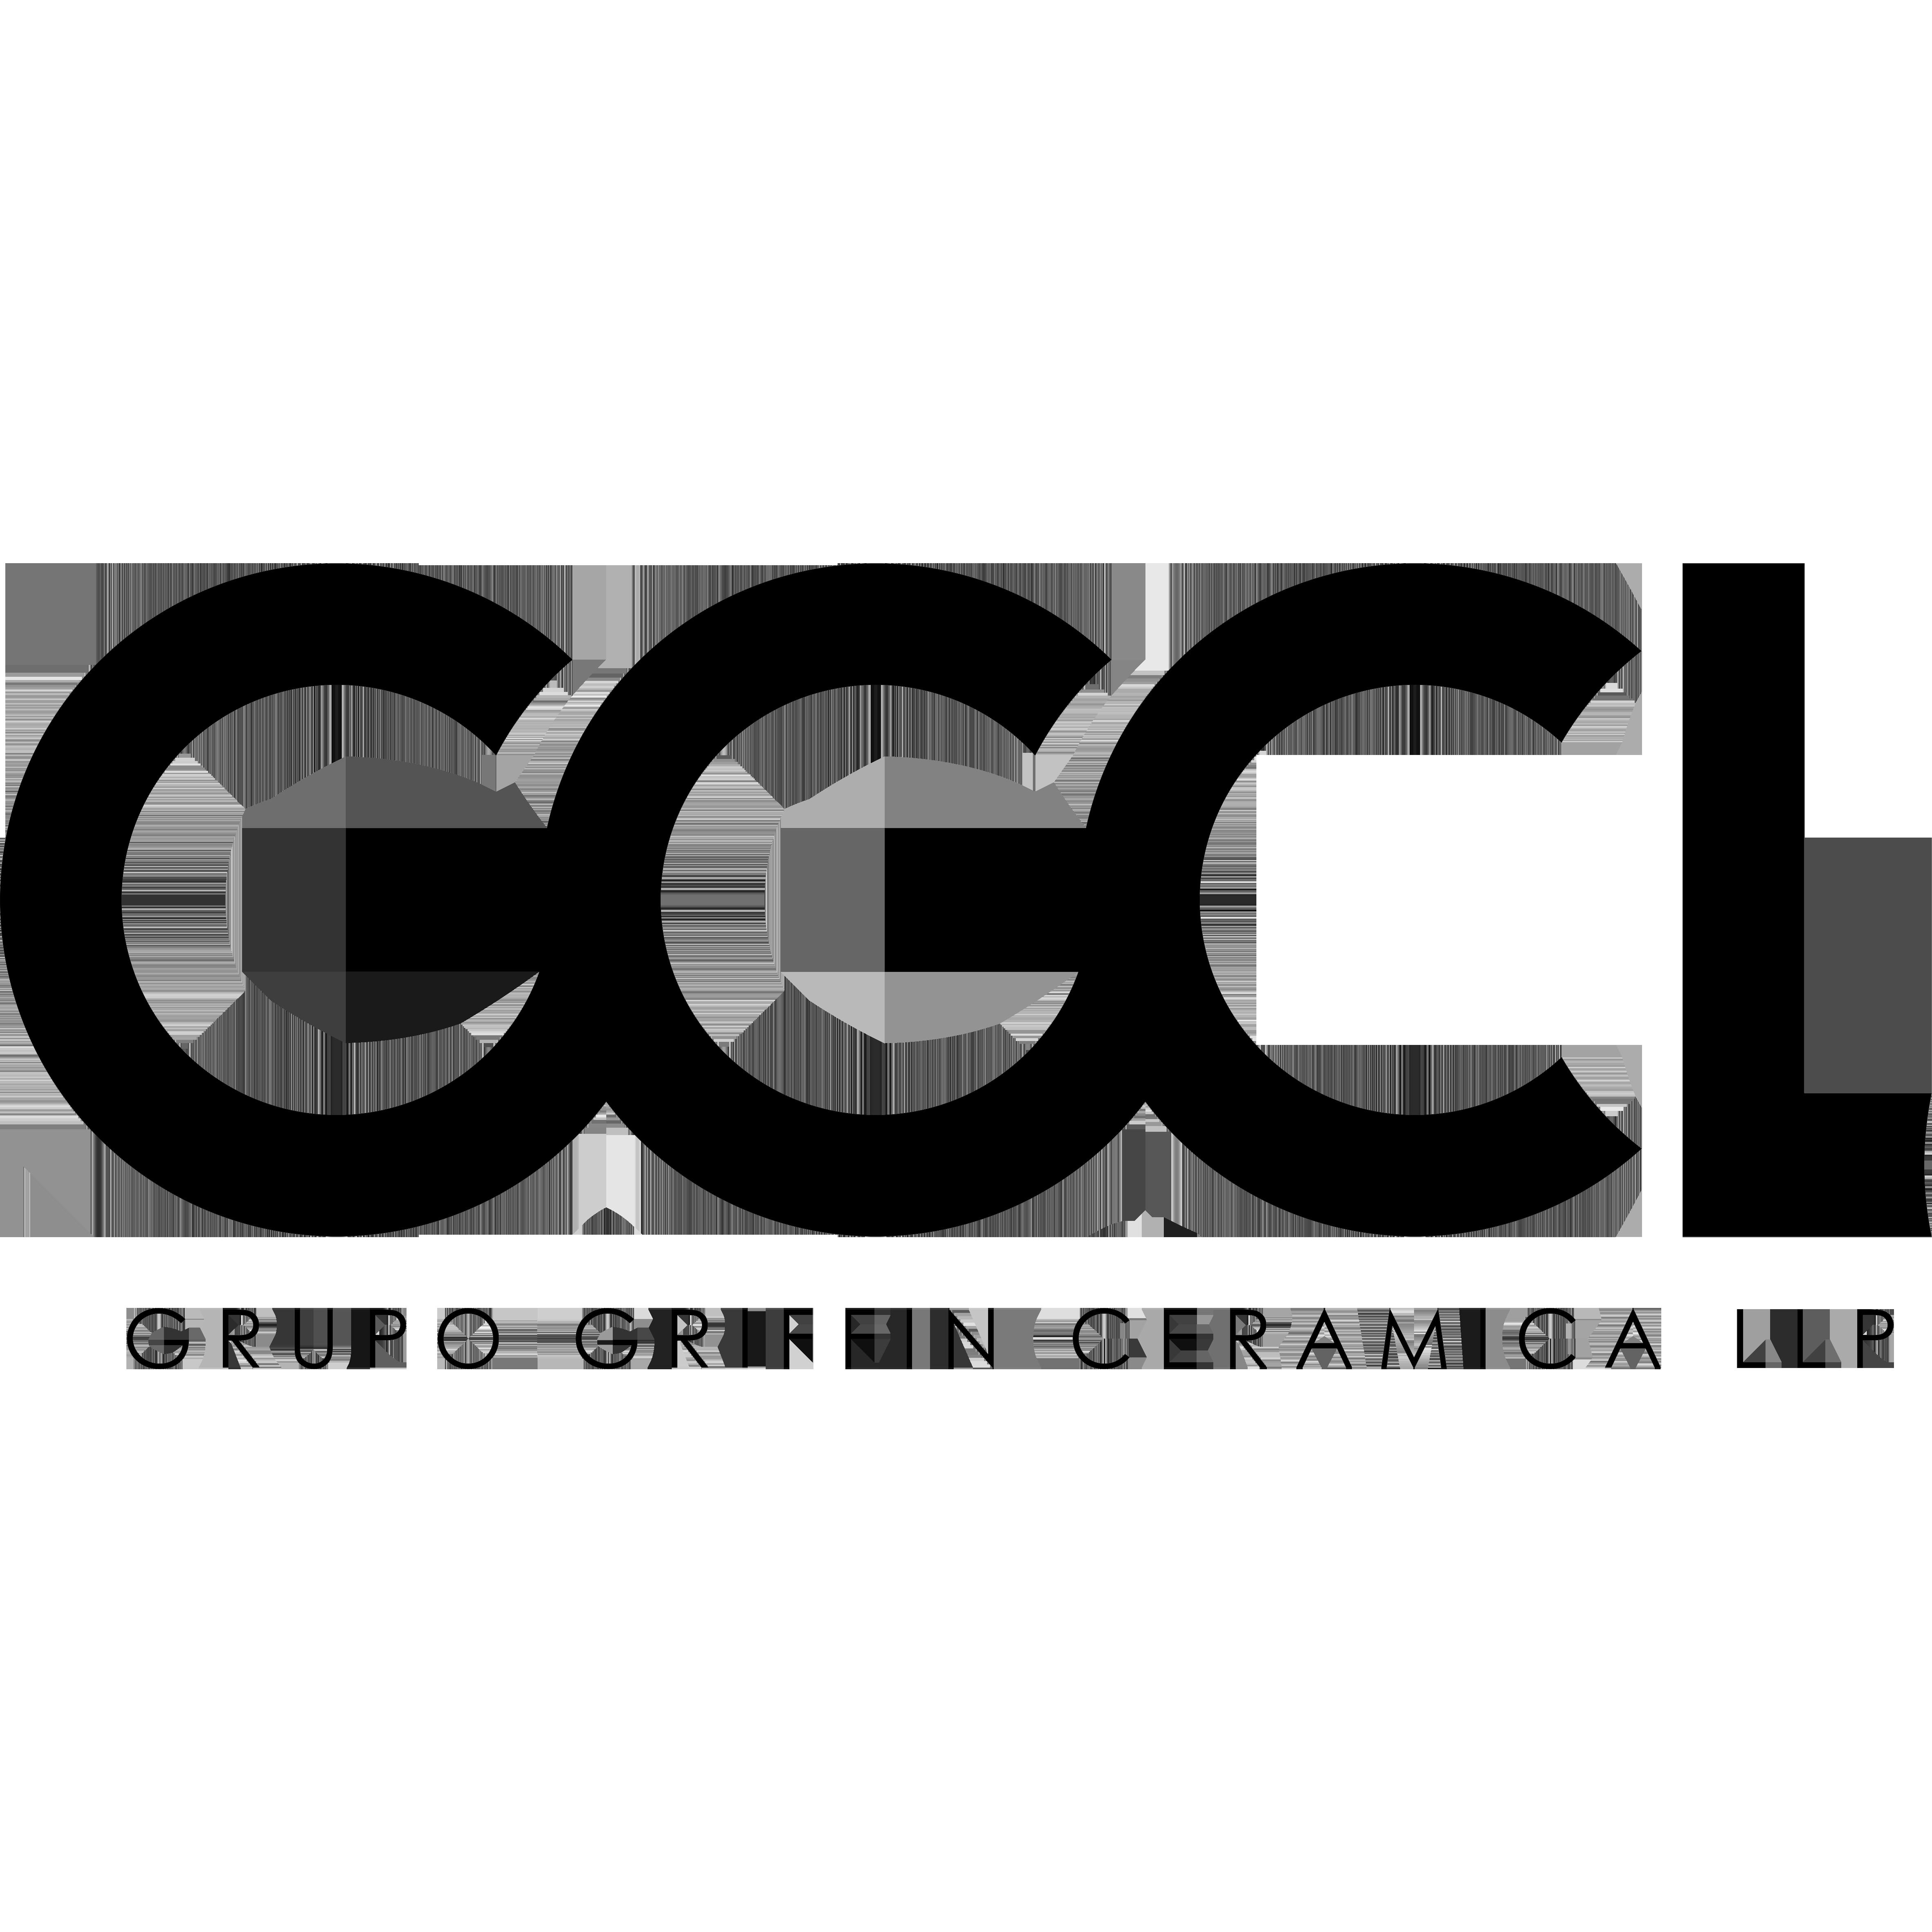 GGCL - GRUPO GRIFFIN CERAMICA LLP